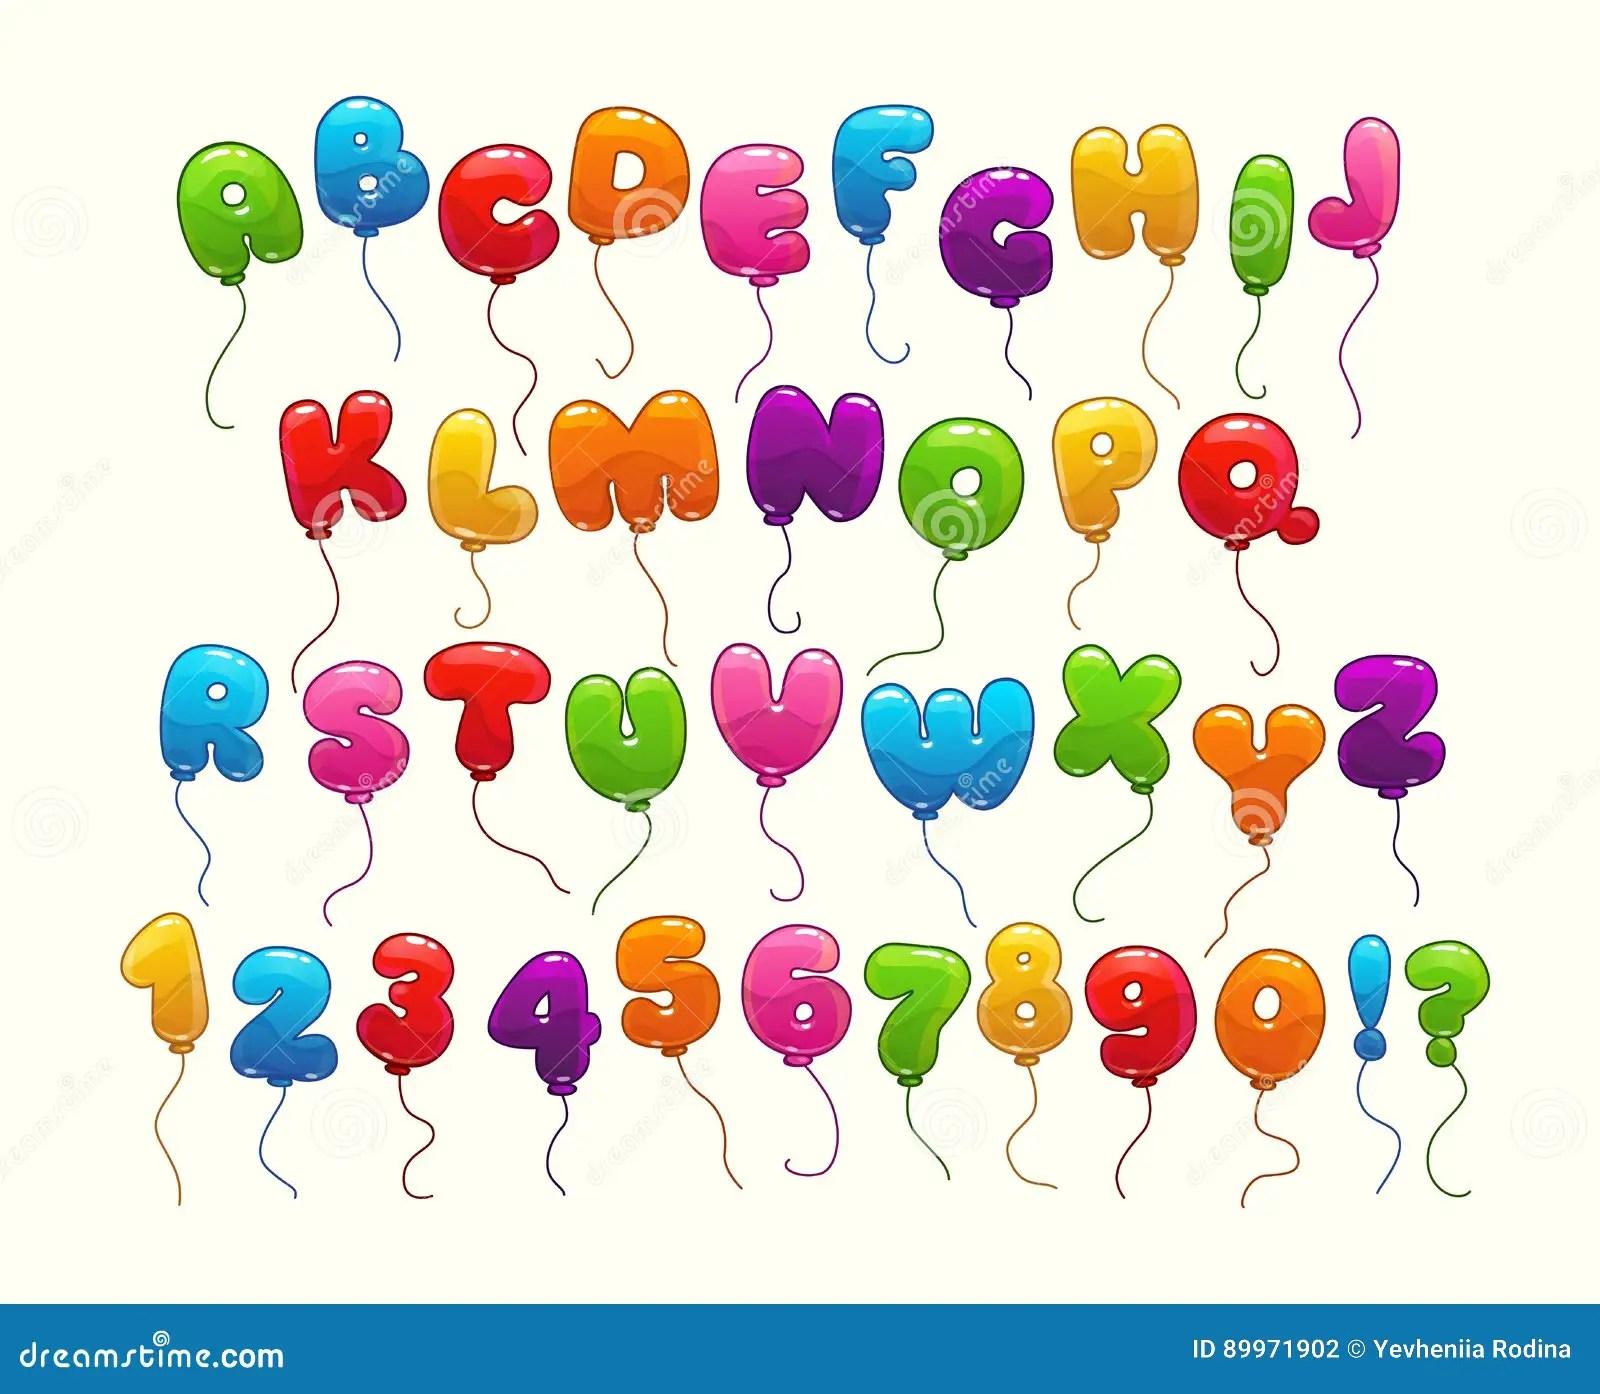 Funny Balloon Alphabet Stock Vector Illustration Of Nice